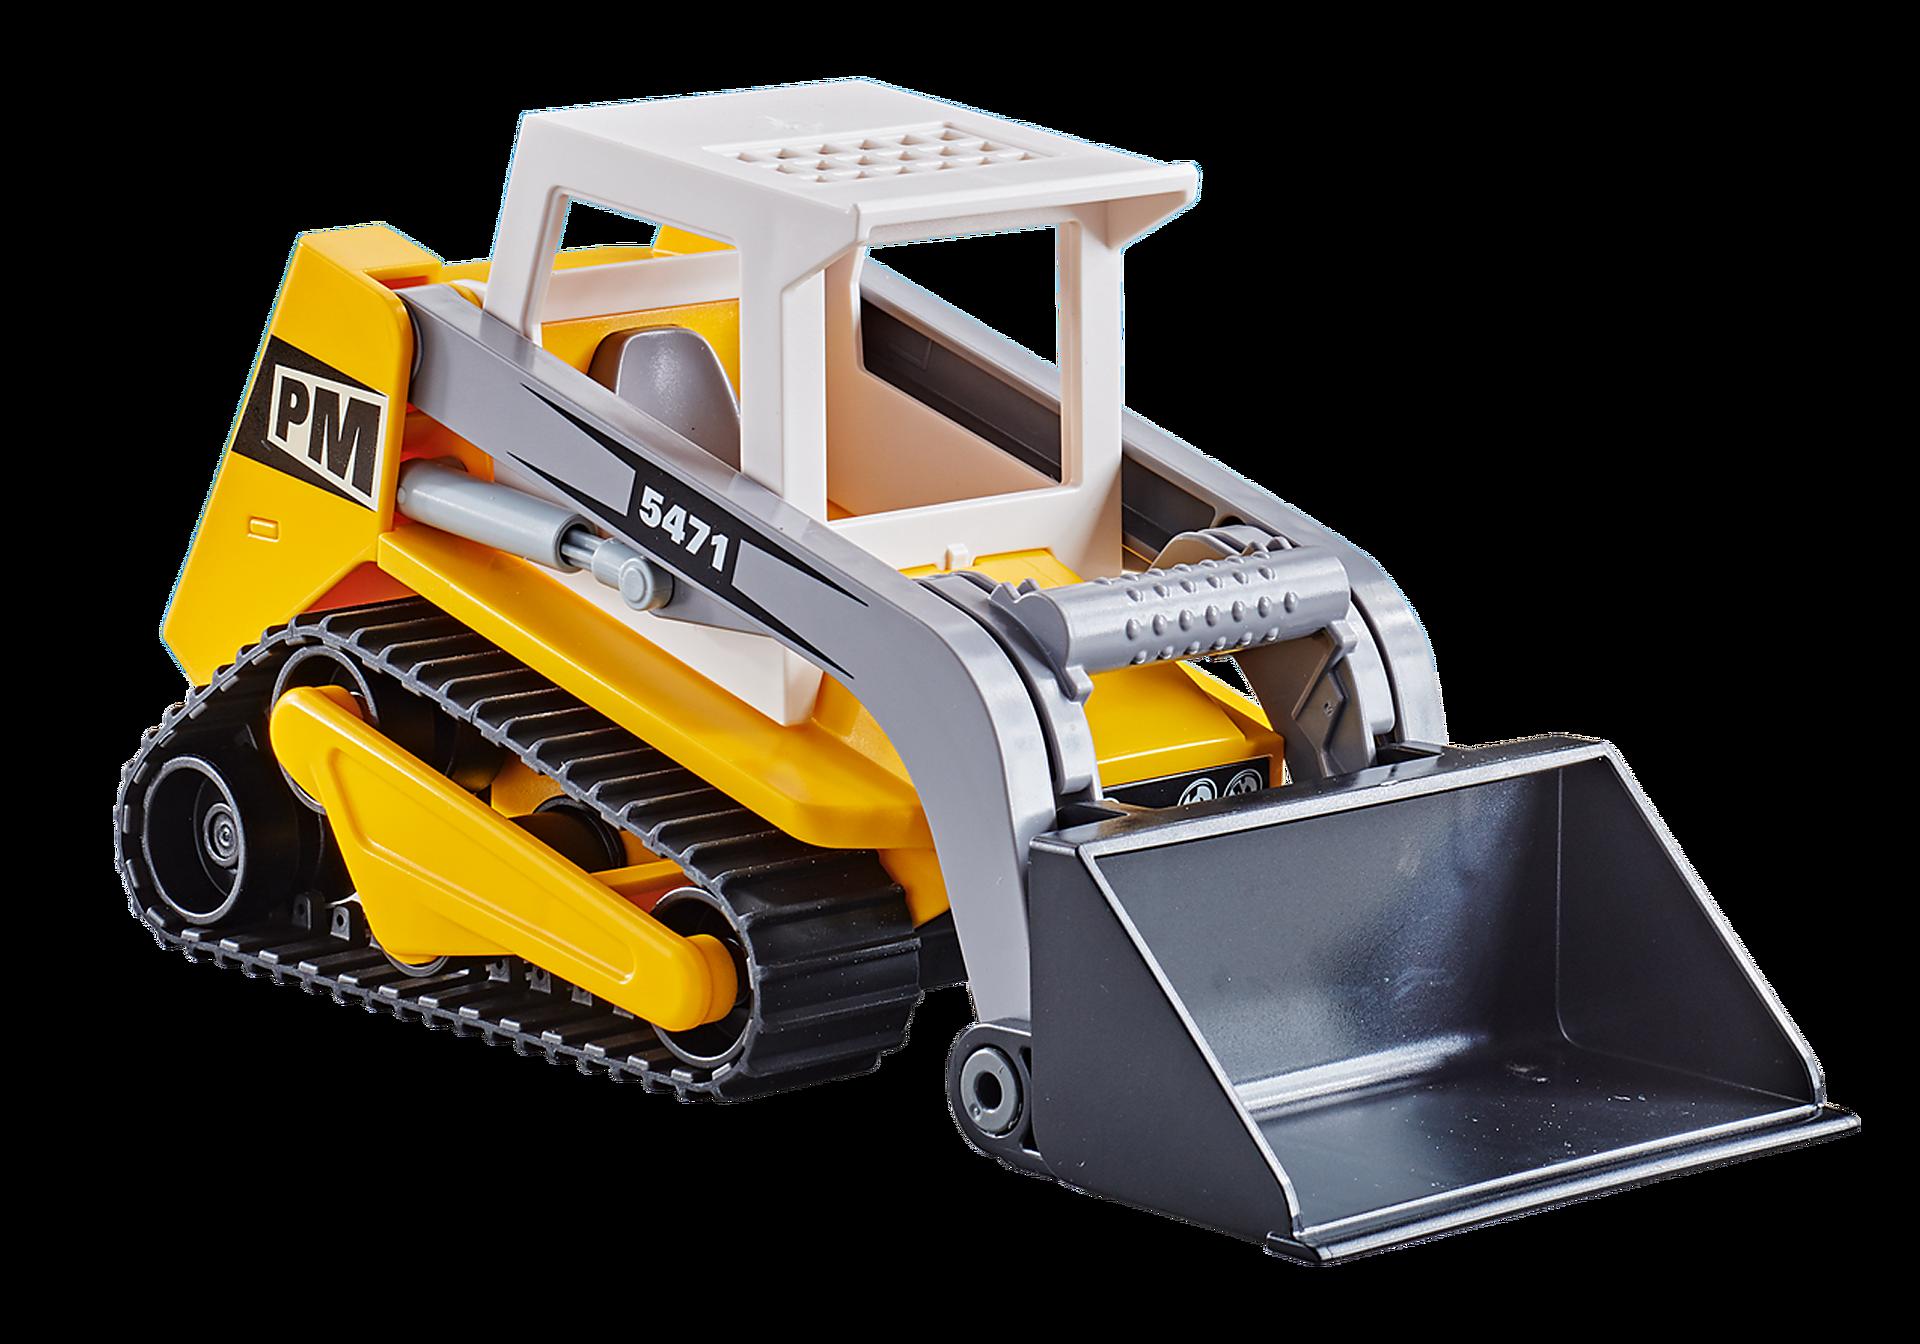 6599 Compact Bulldozer zoom image1